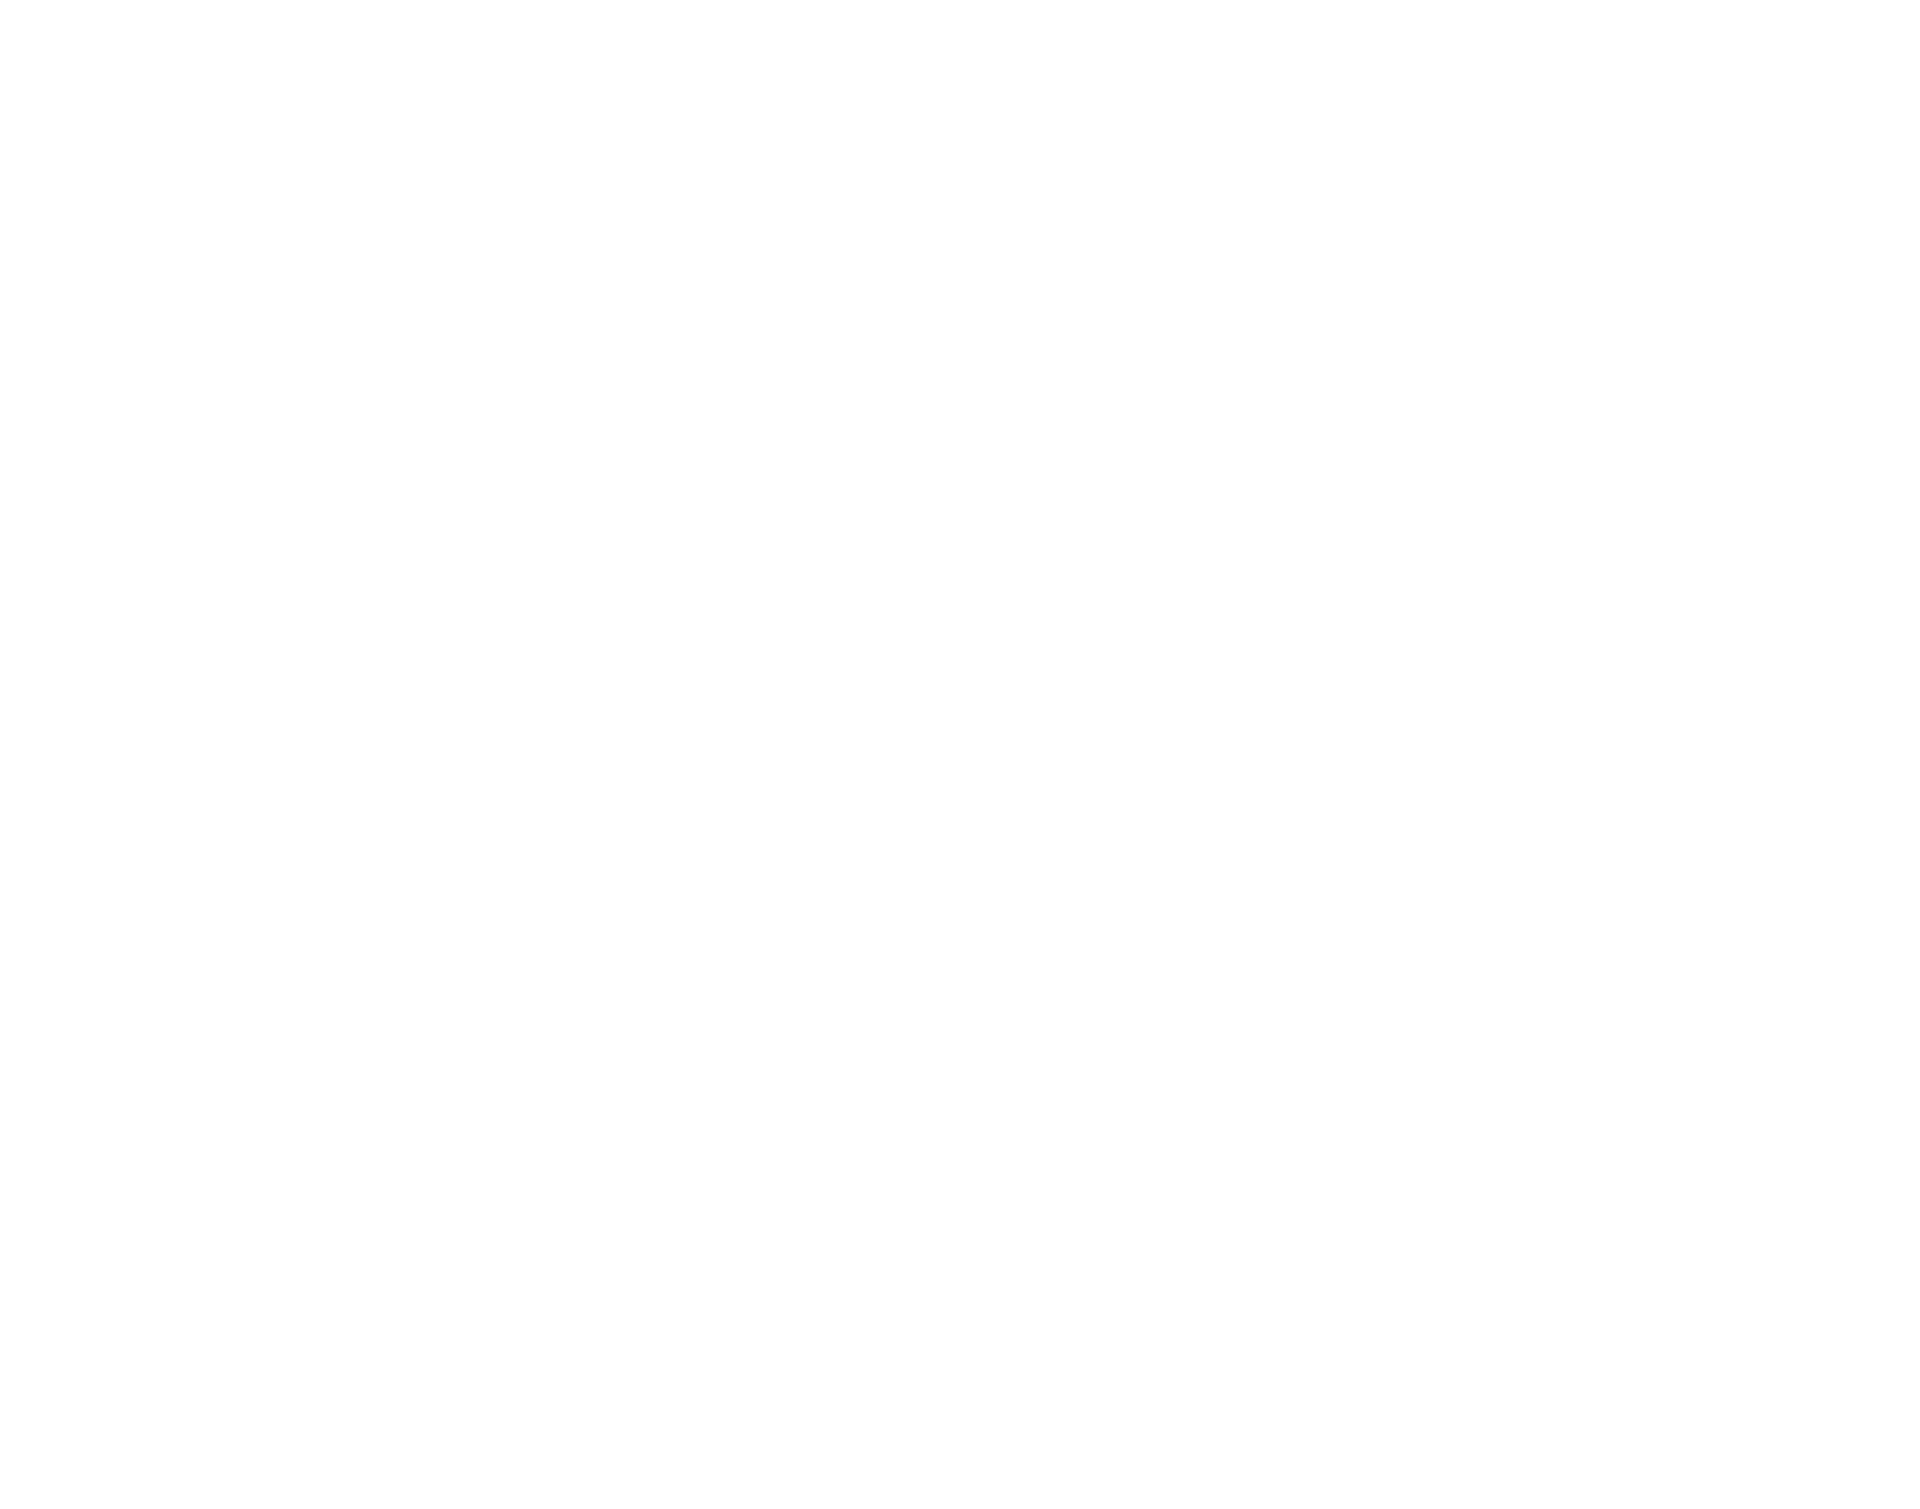 Oremandsgaard Kammermusikfest Kammermusikfest 2018